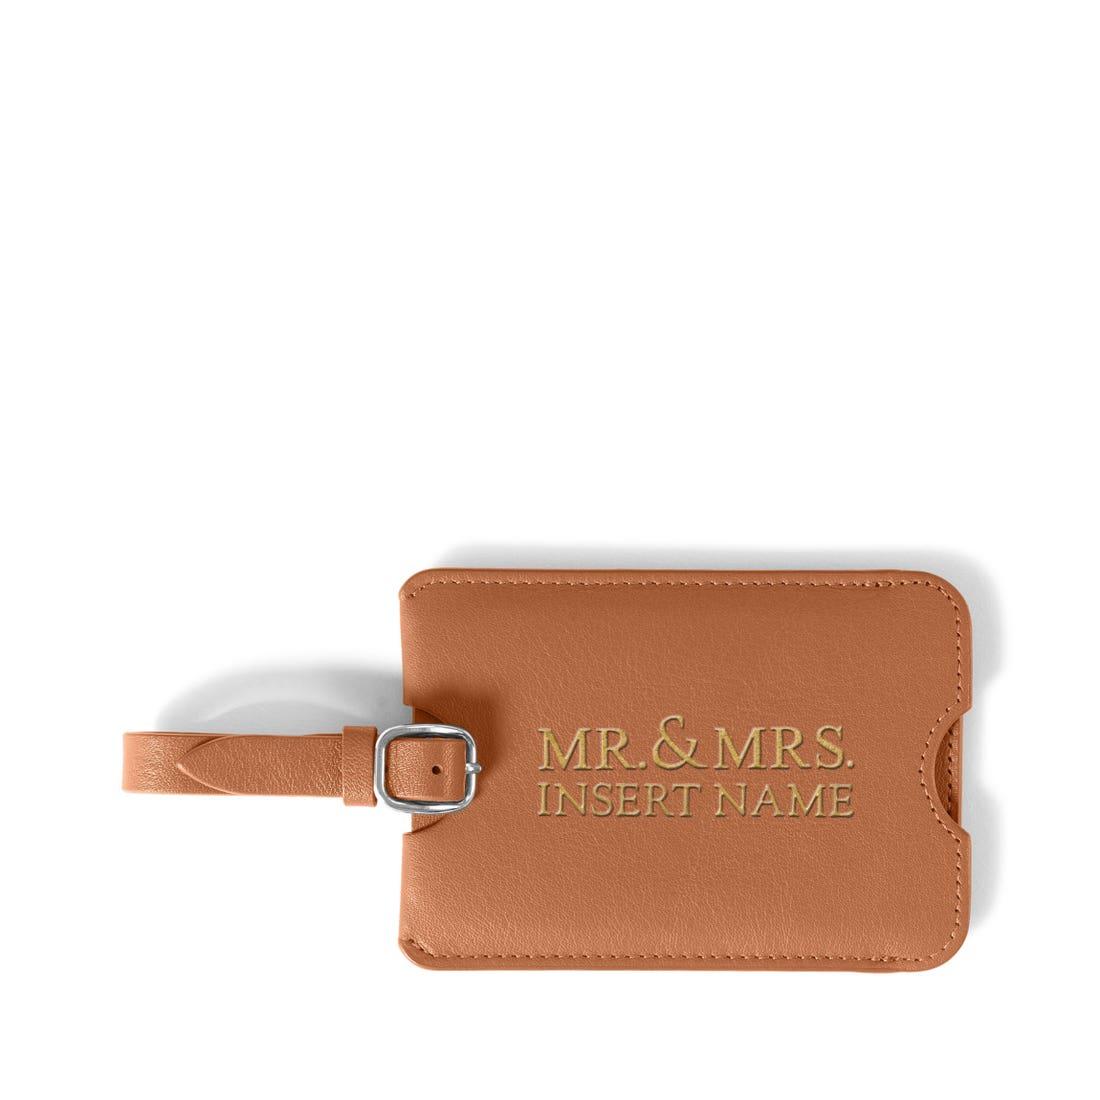 Mr & Mrs Luggage Tag